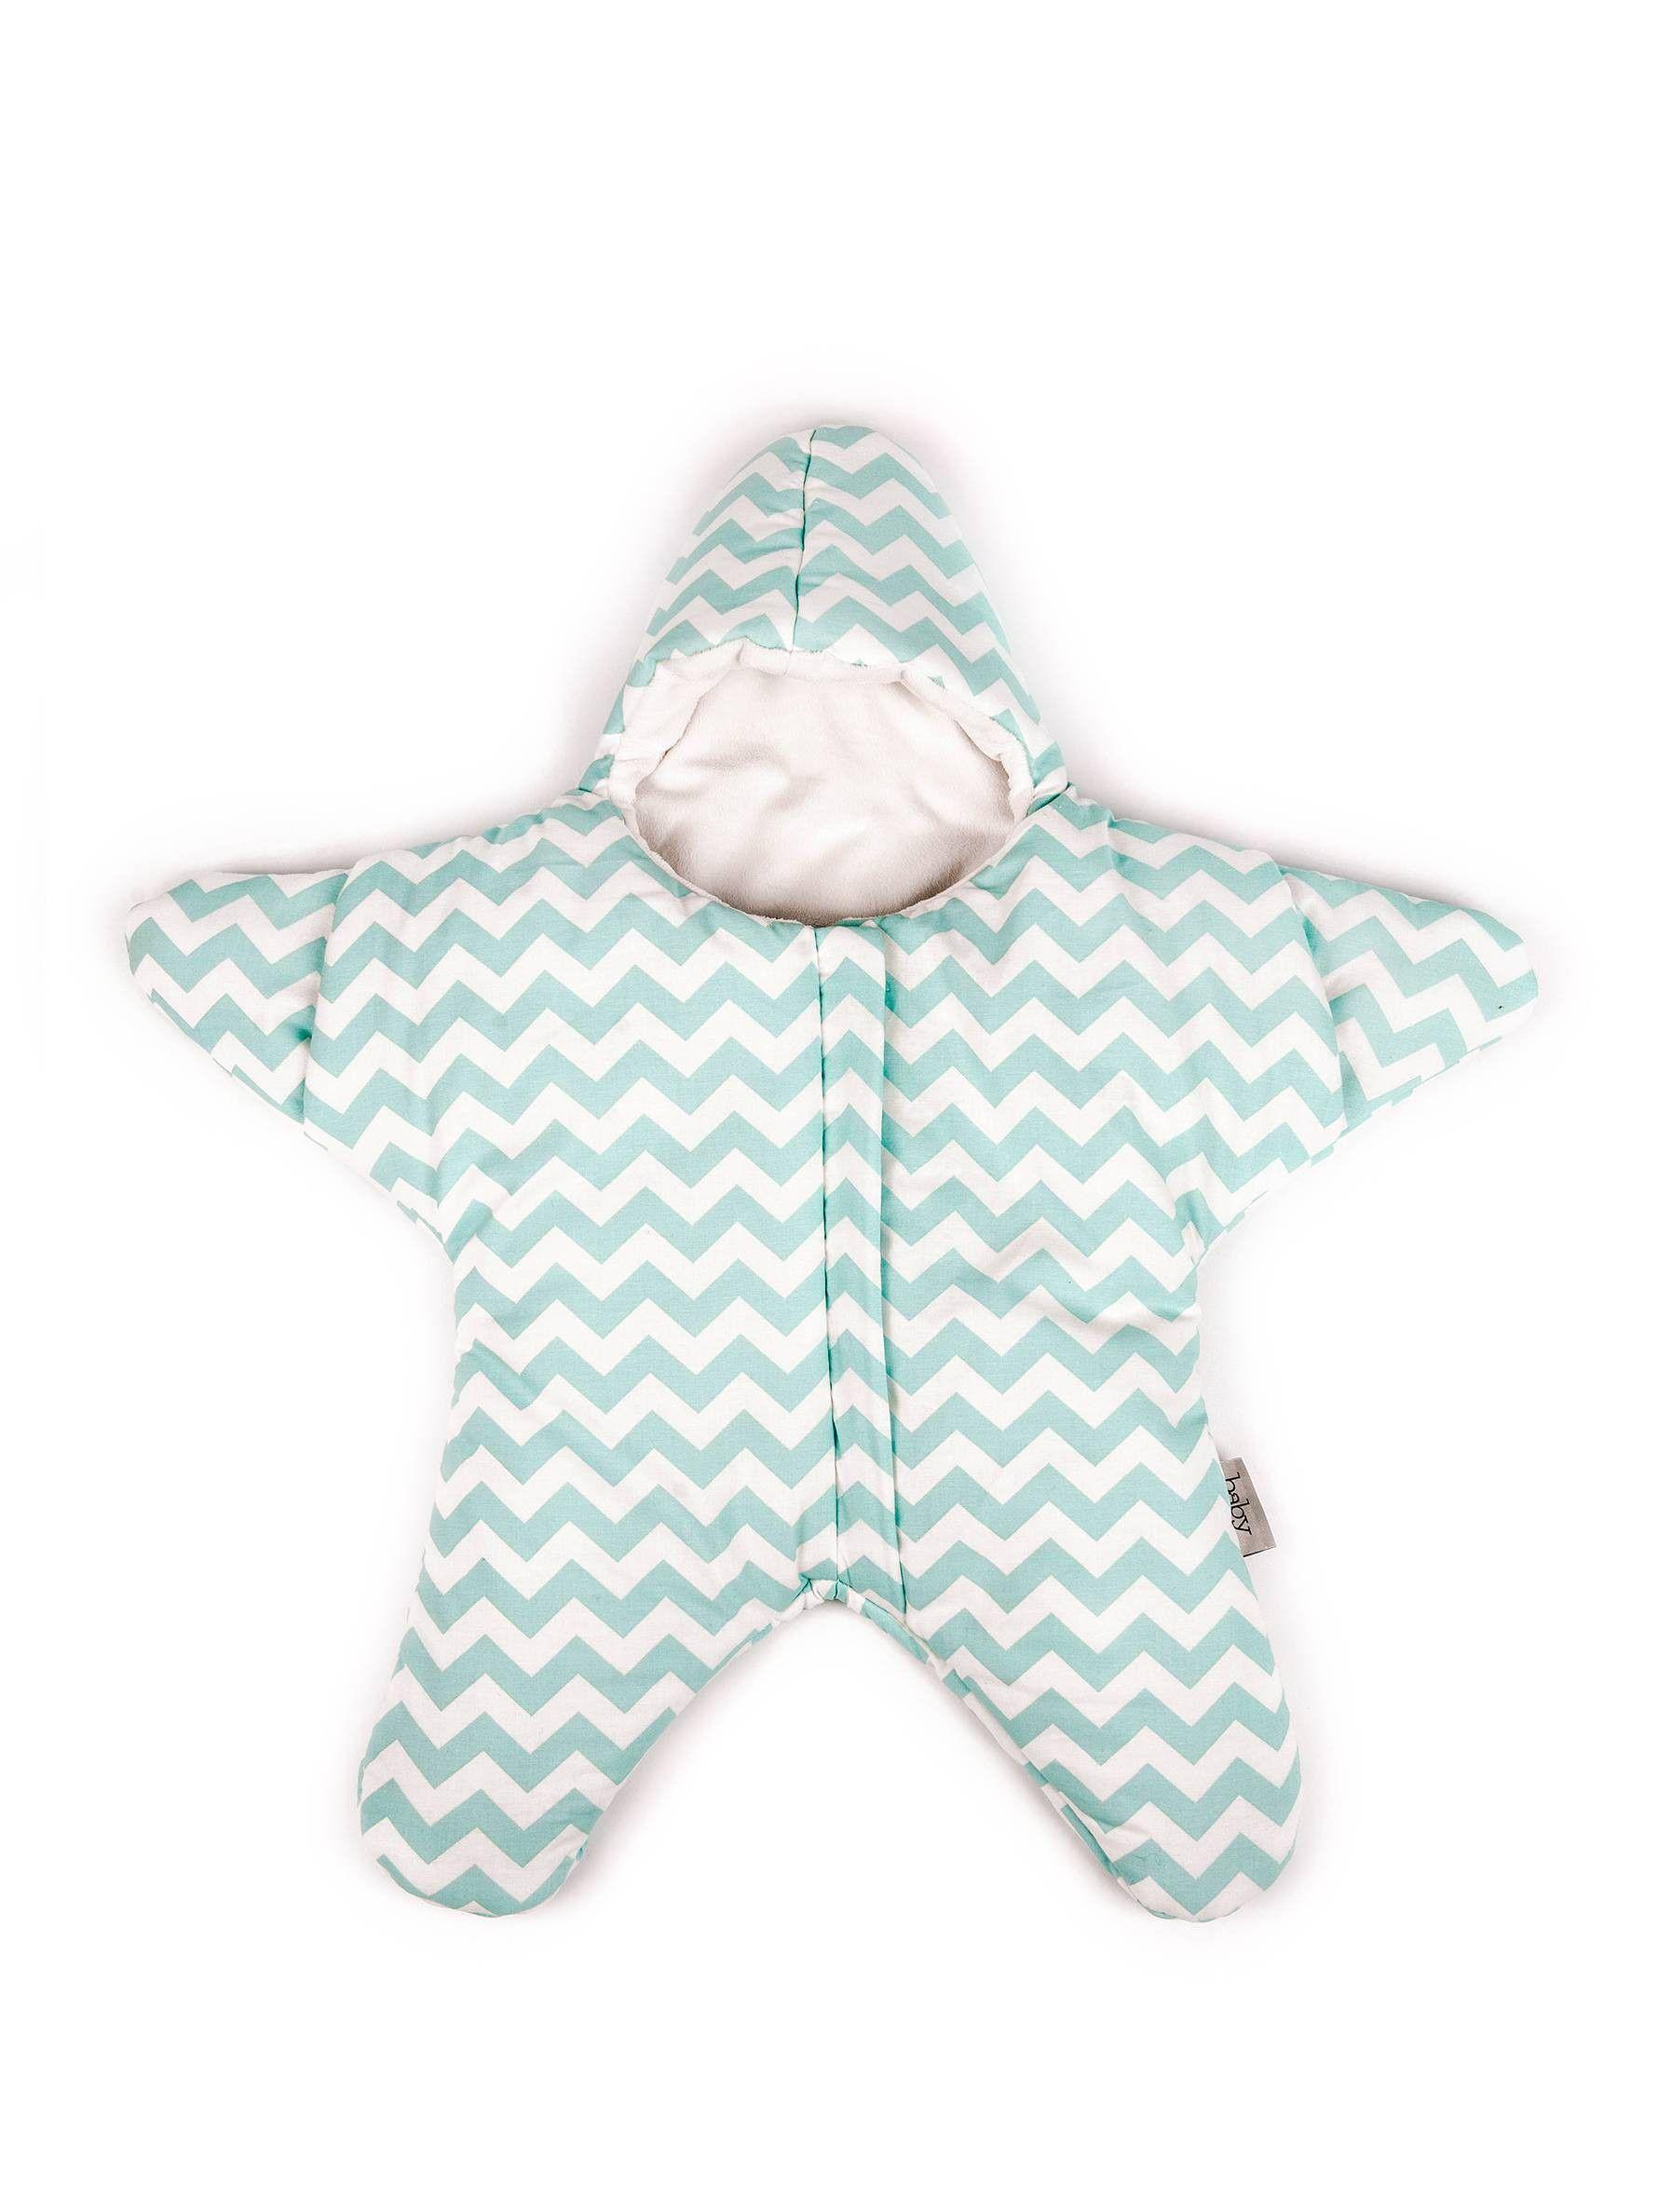 Baby Bites Star Sleeping Bag